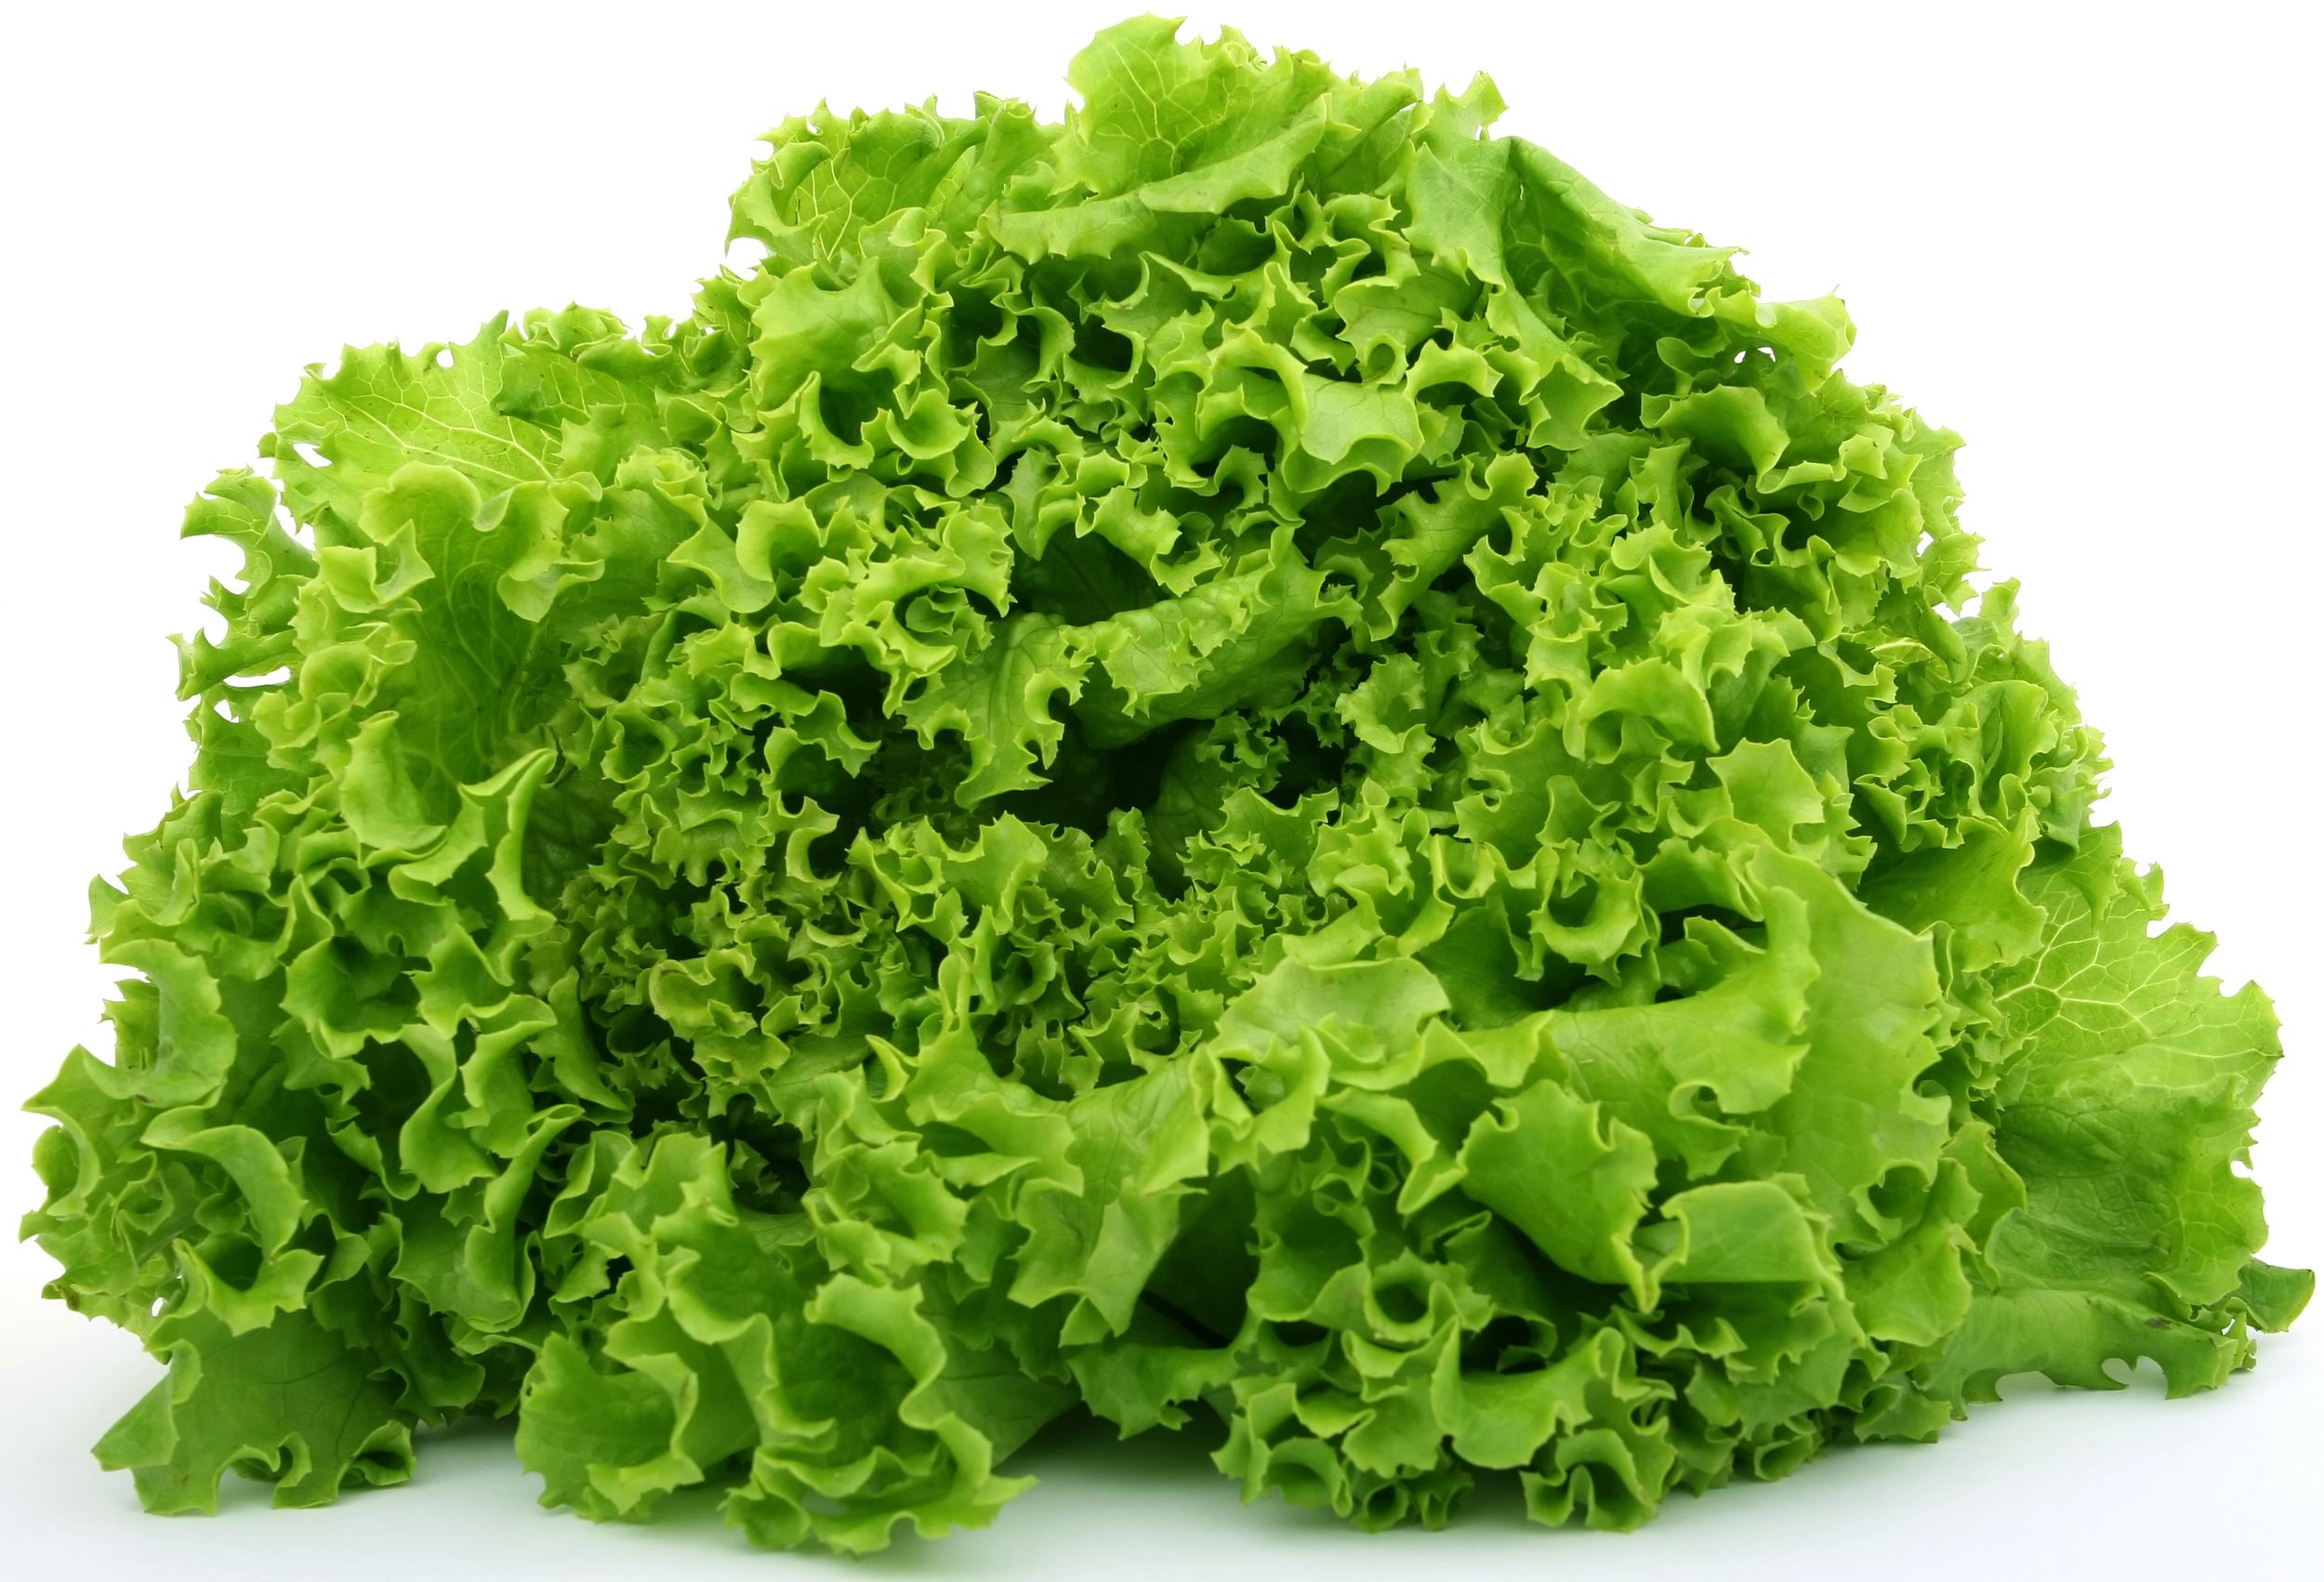 Looseleaf (Cutting) Lettuce